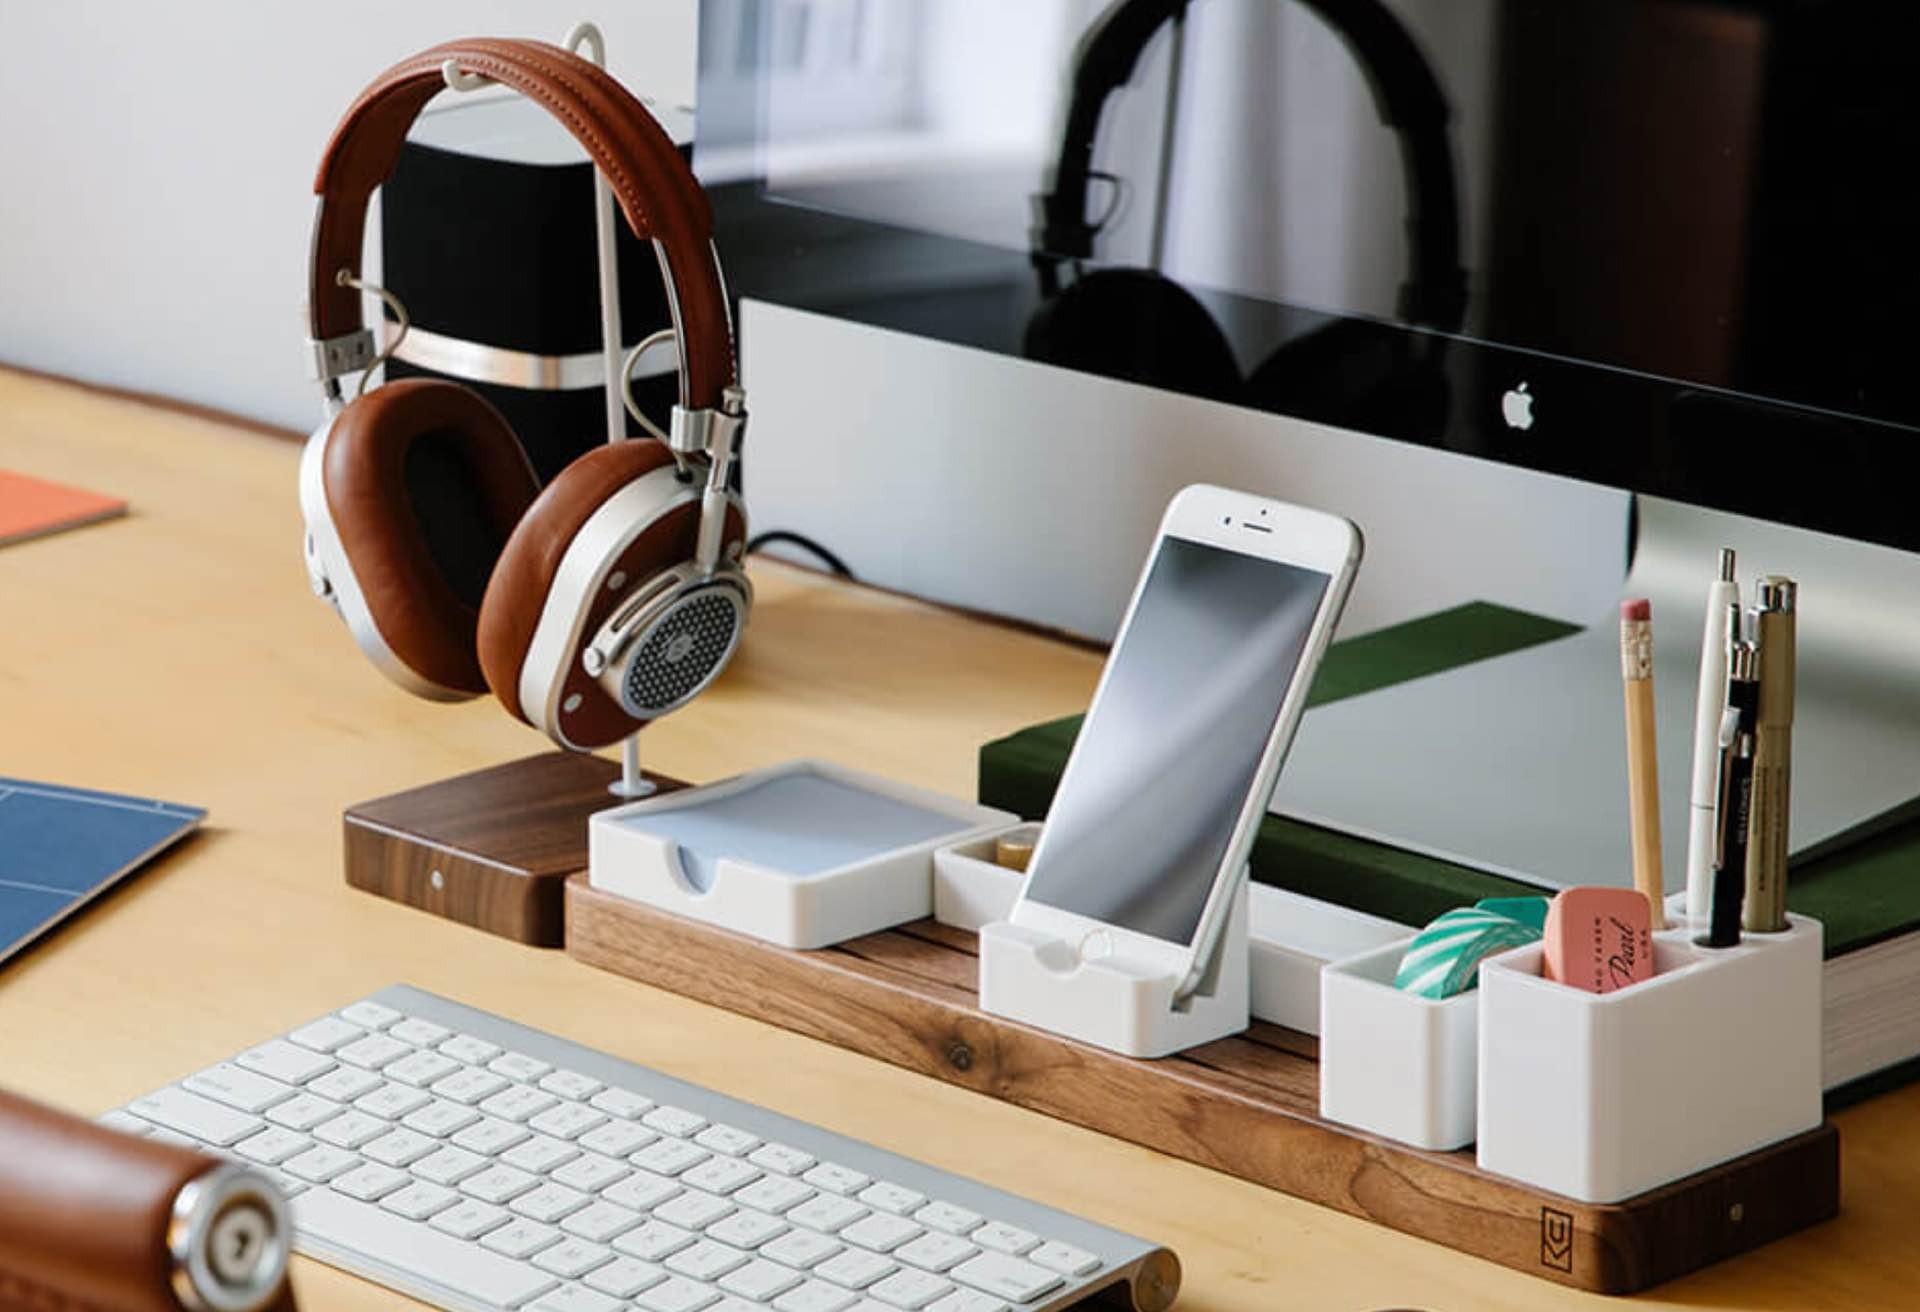 master-and-dynamic-mh40-headphones-ugmonk-gather-jeff-sheldon